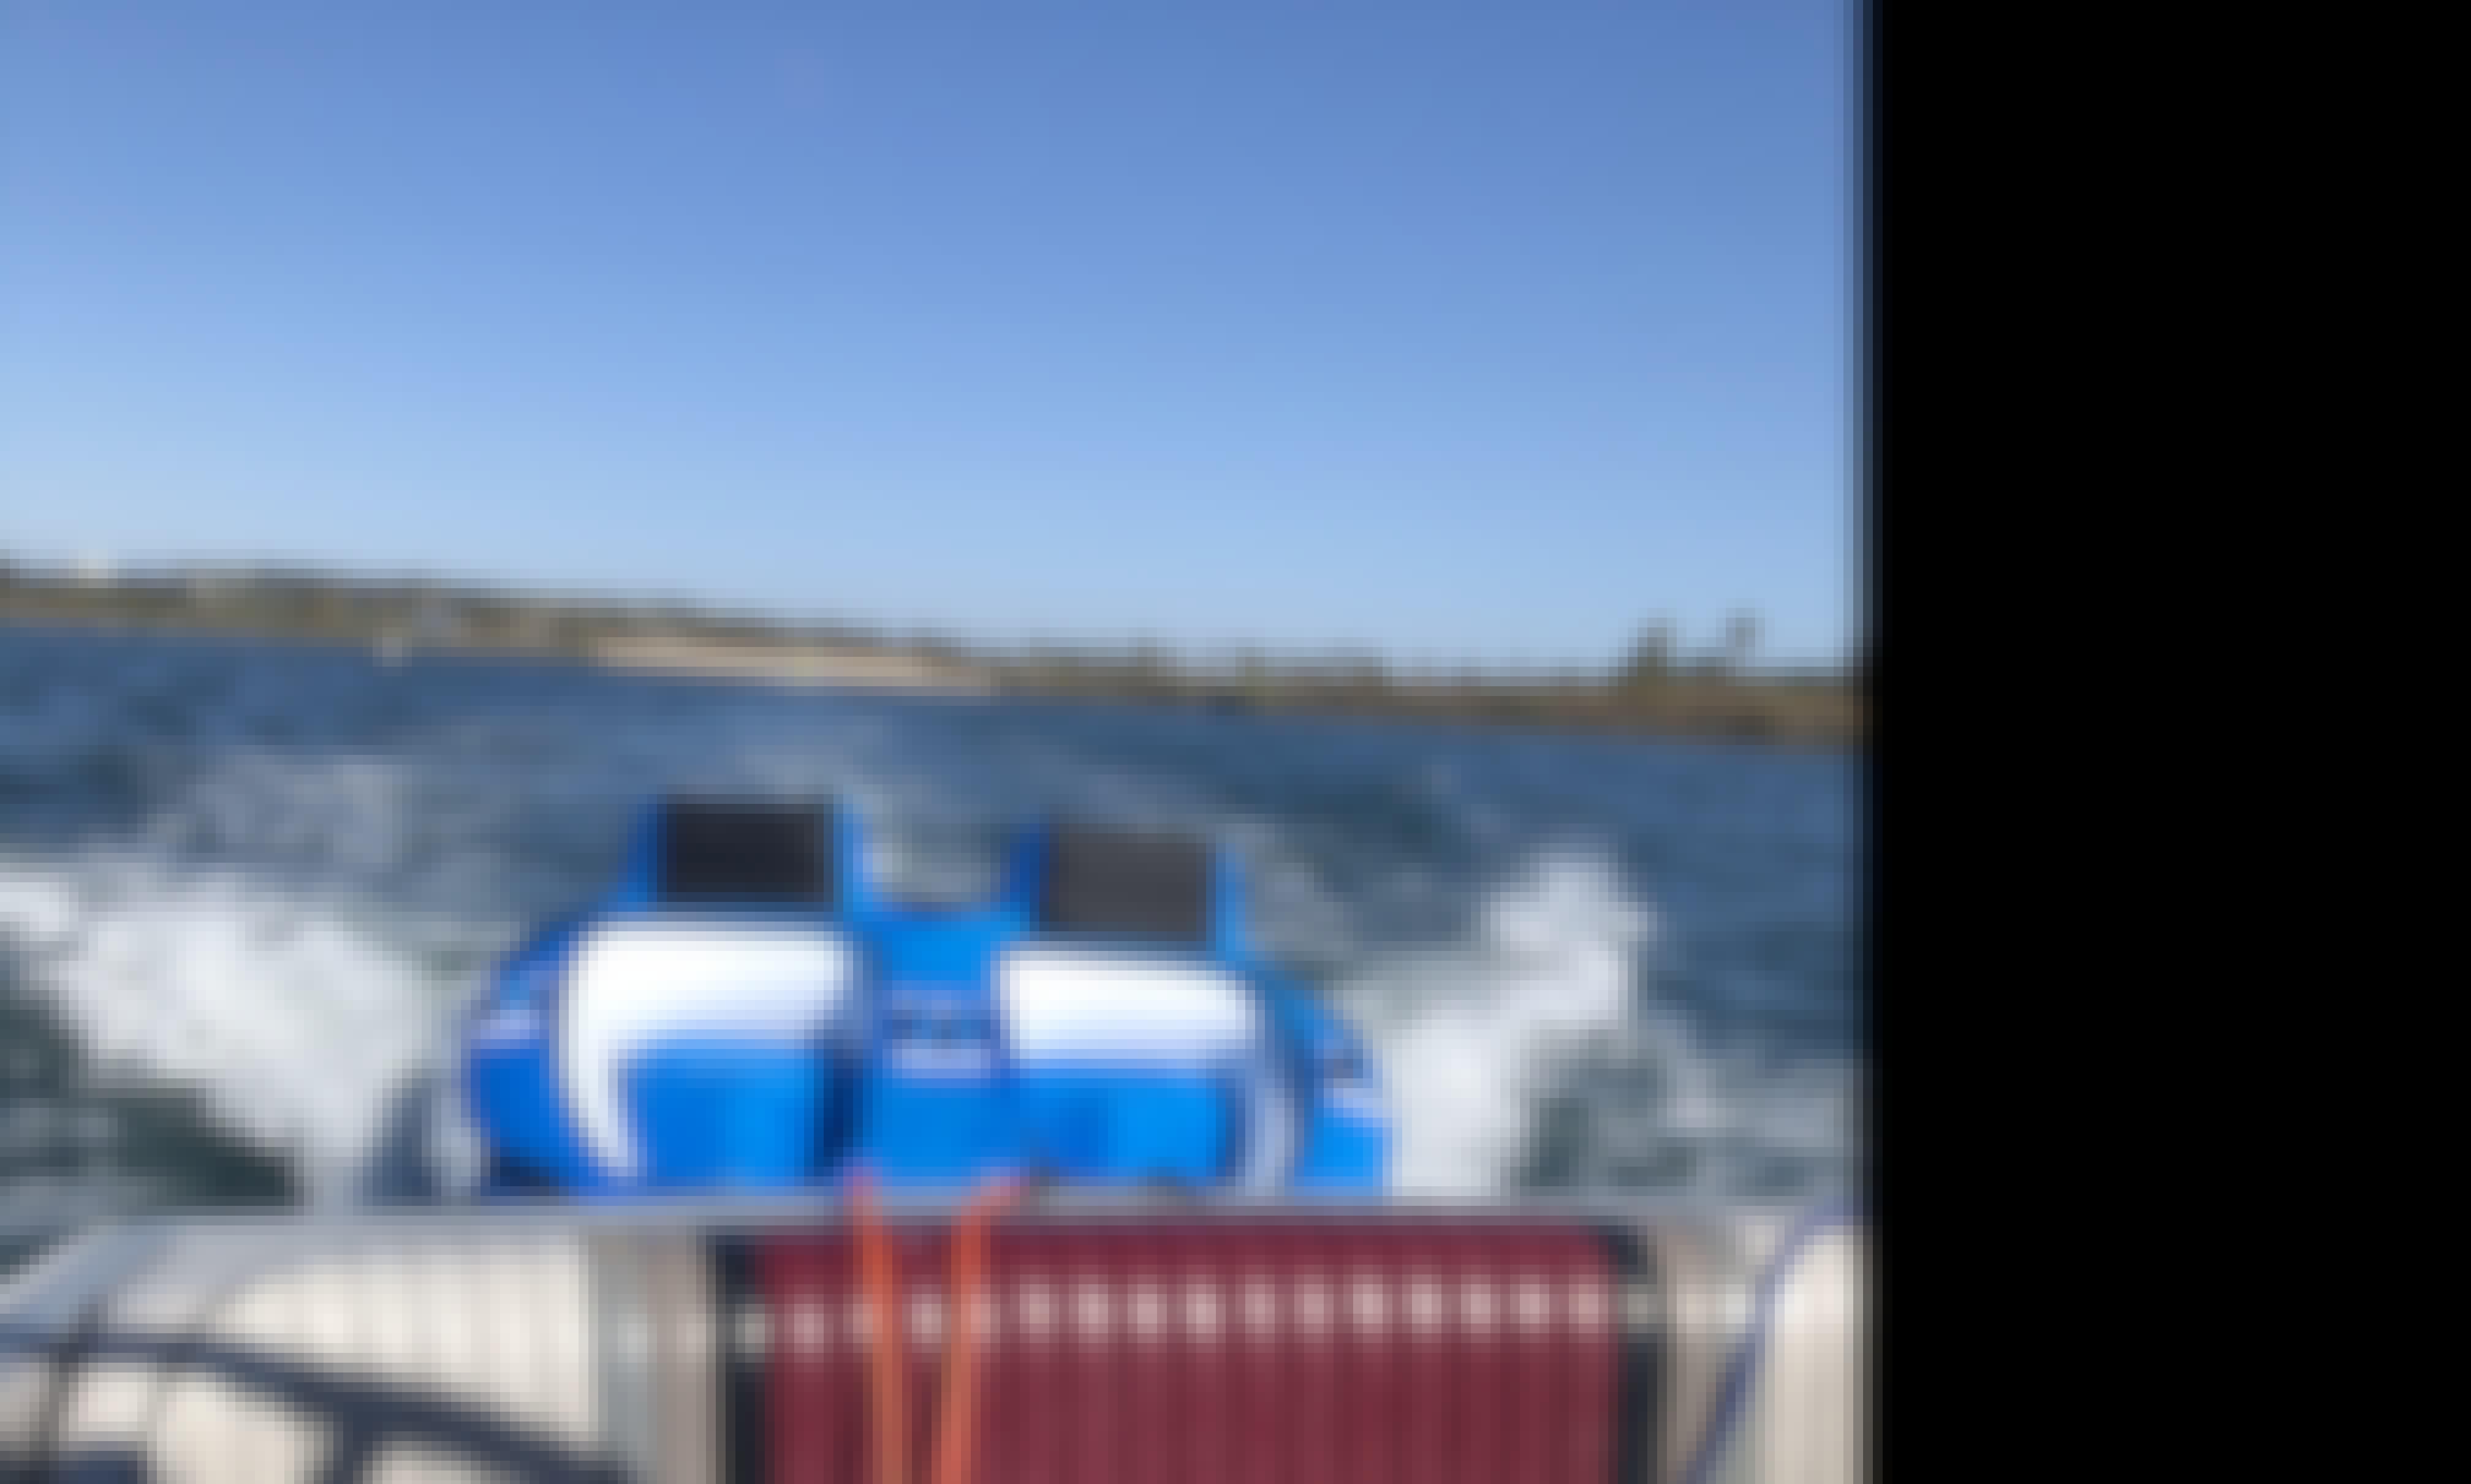 Amazing Water Sports Boat Malibu Sunsetter 20FT for Tubing - Wakeboarding, Cruising -10 People